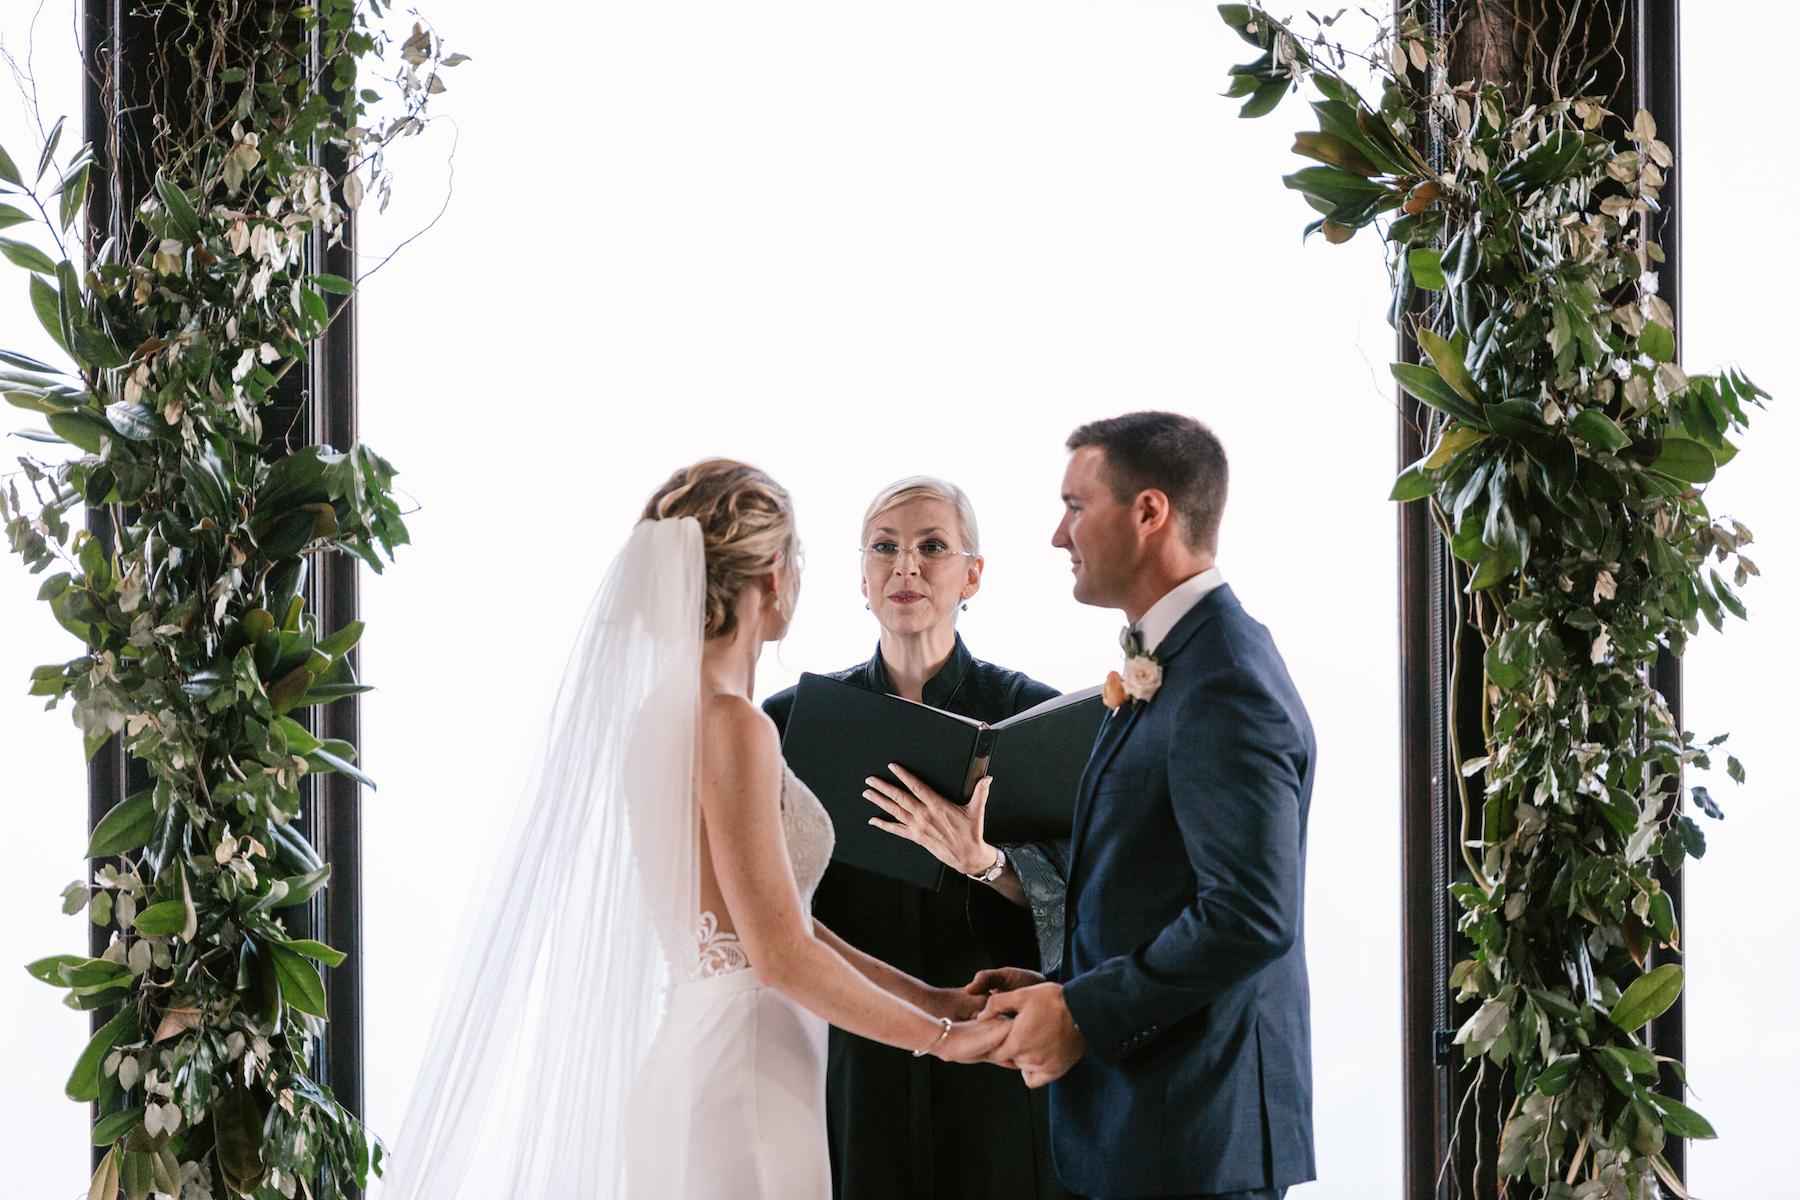 wedding-engagement-photographer-spartanburg-greenville-columbia-carolina-south-north-487.JPG